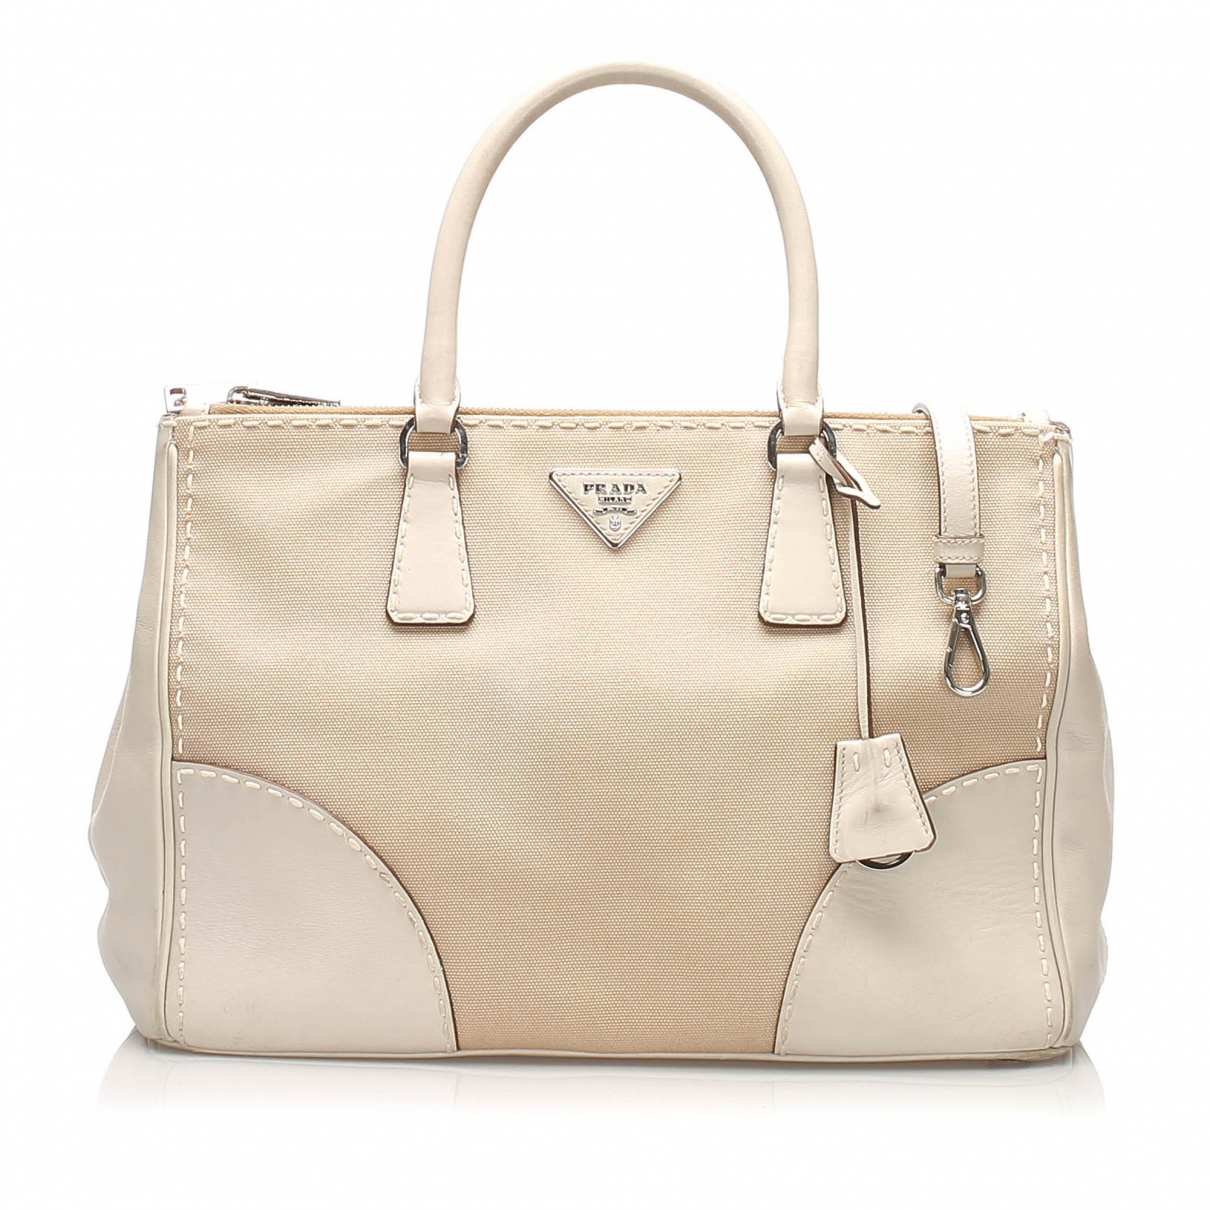 Prada N Brown Cloth handbag for Women N